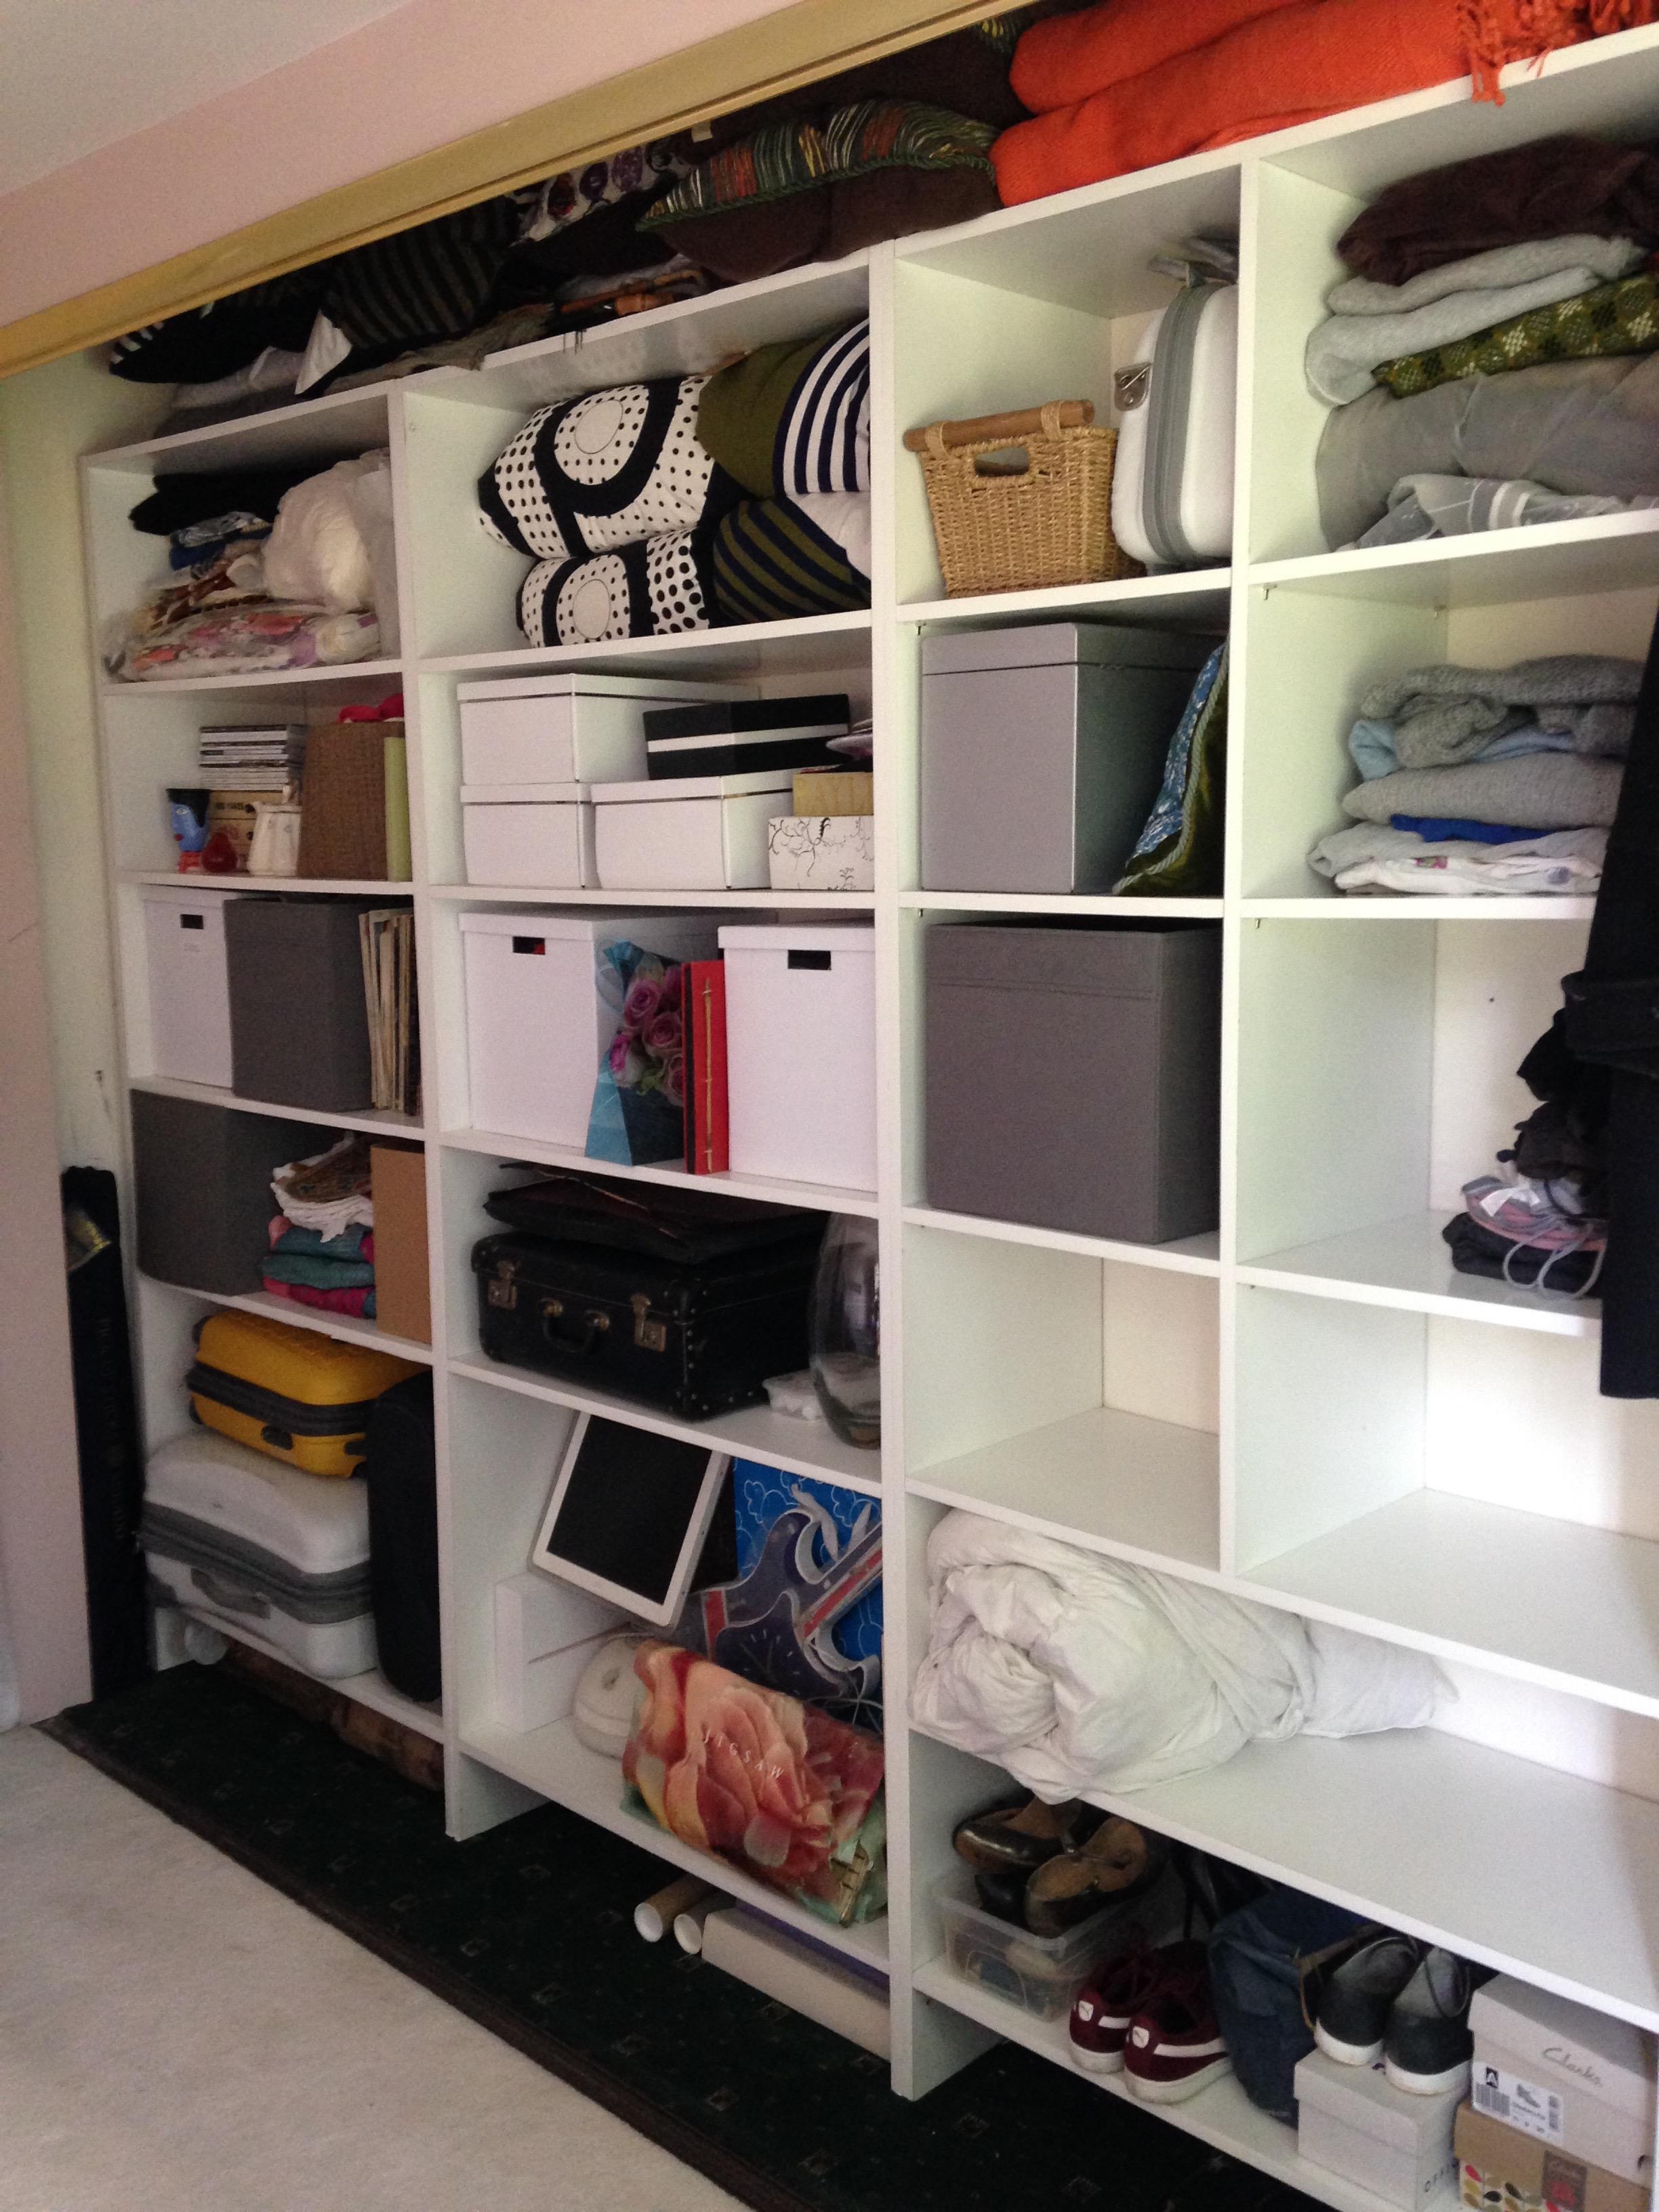 lisa's minimalist shelves post declutter